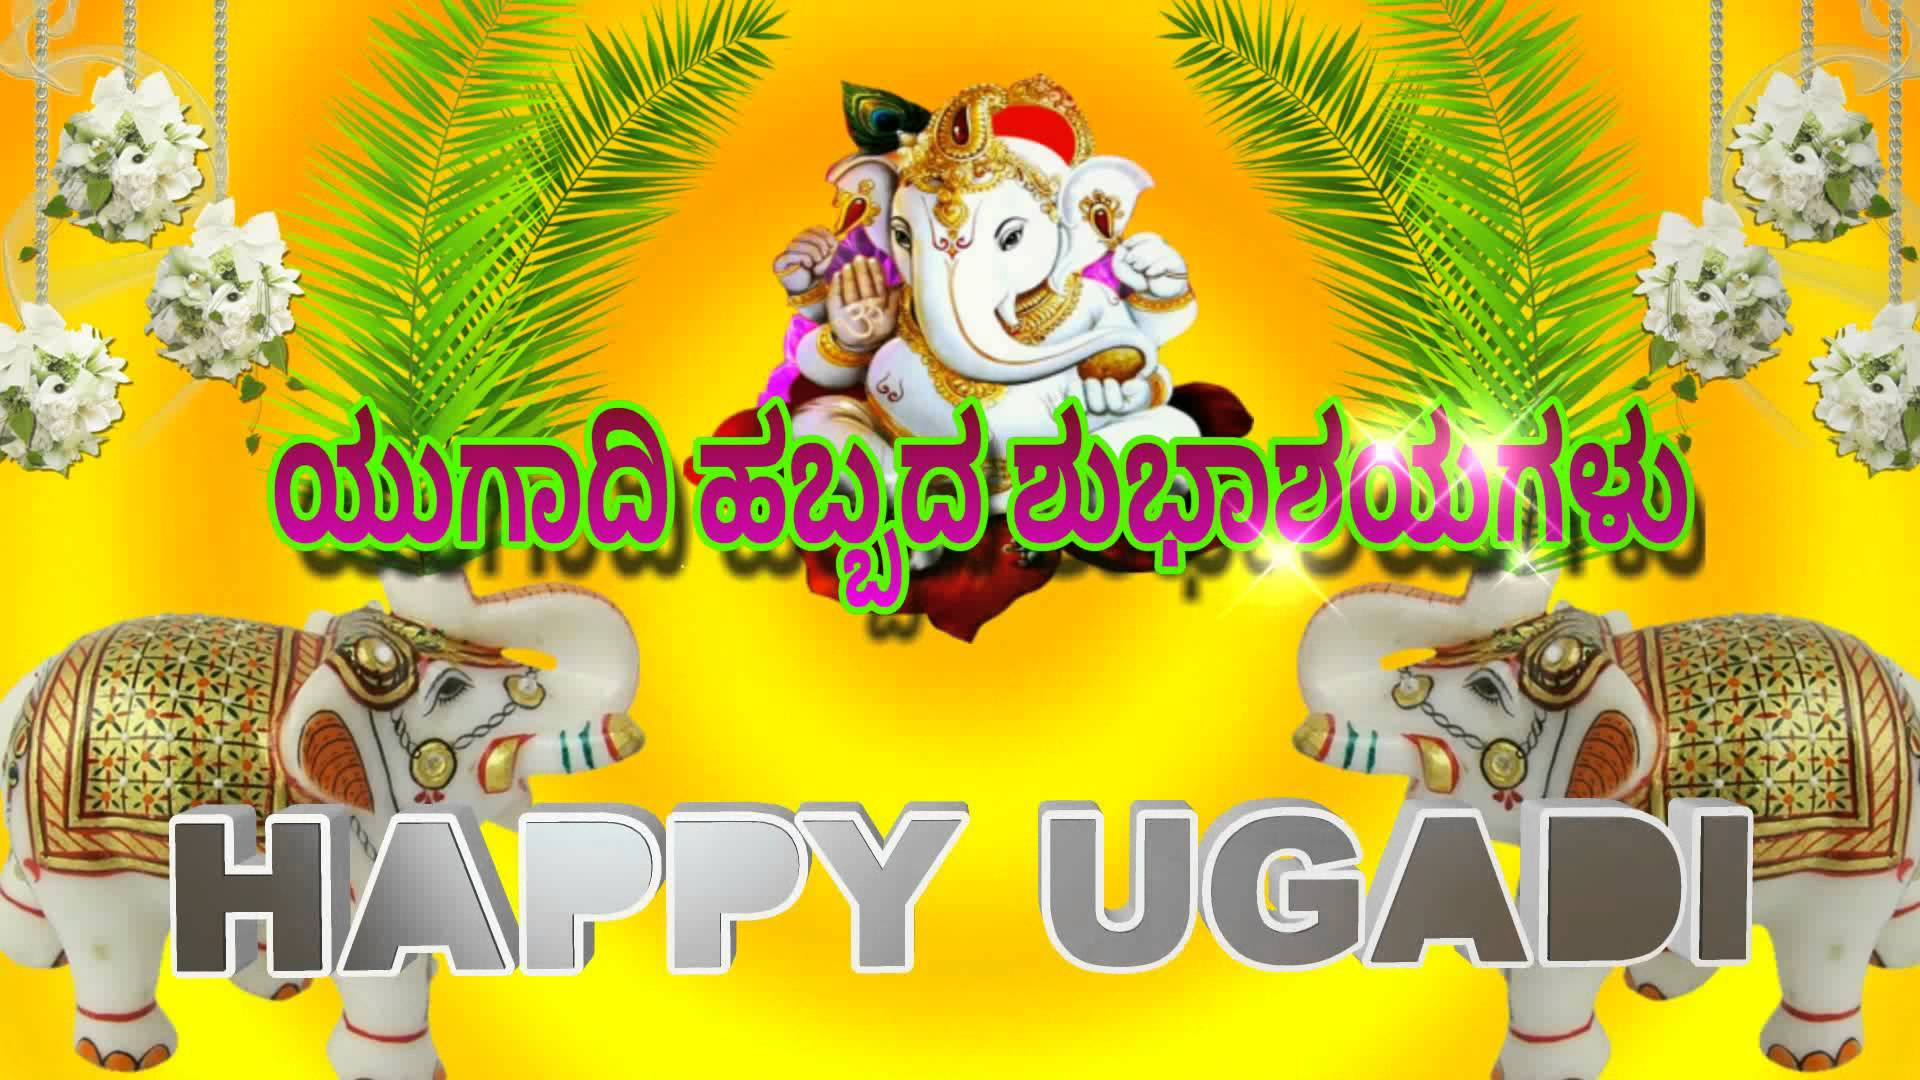 Festival clipart ugadi Ugadi Video Wishes Greetings New